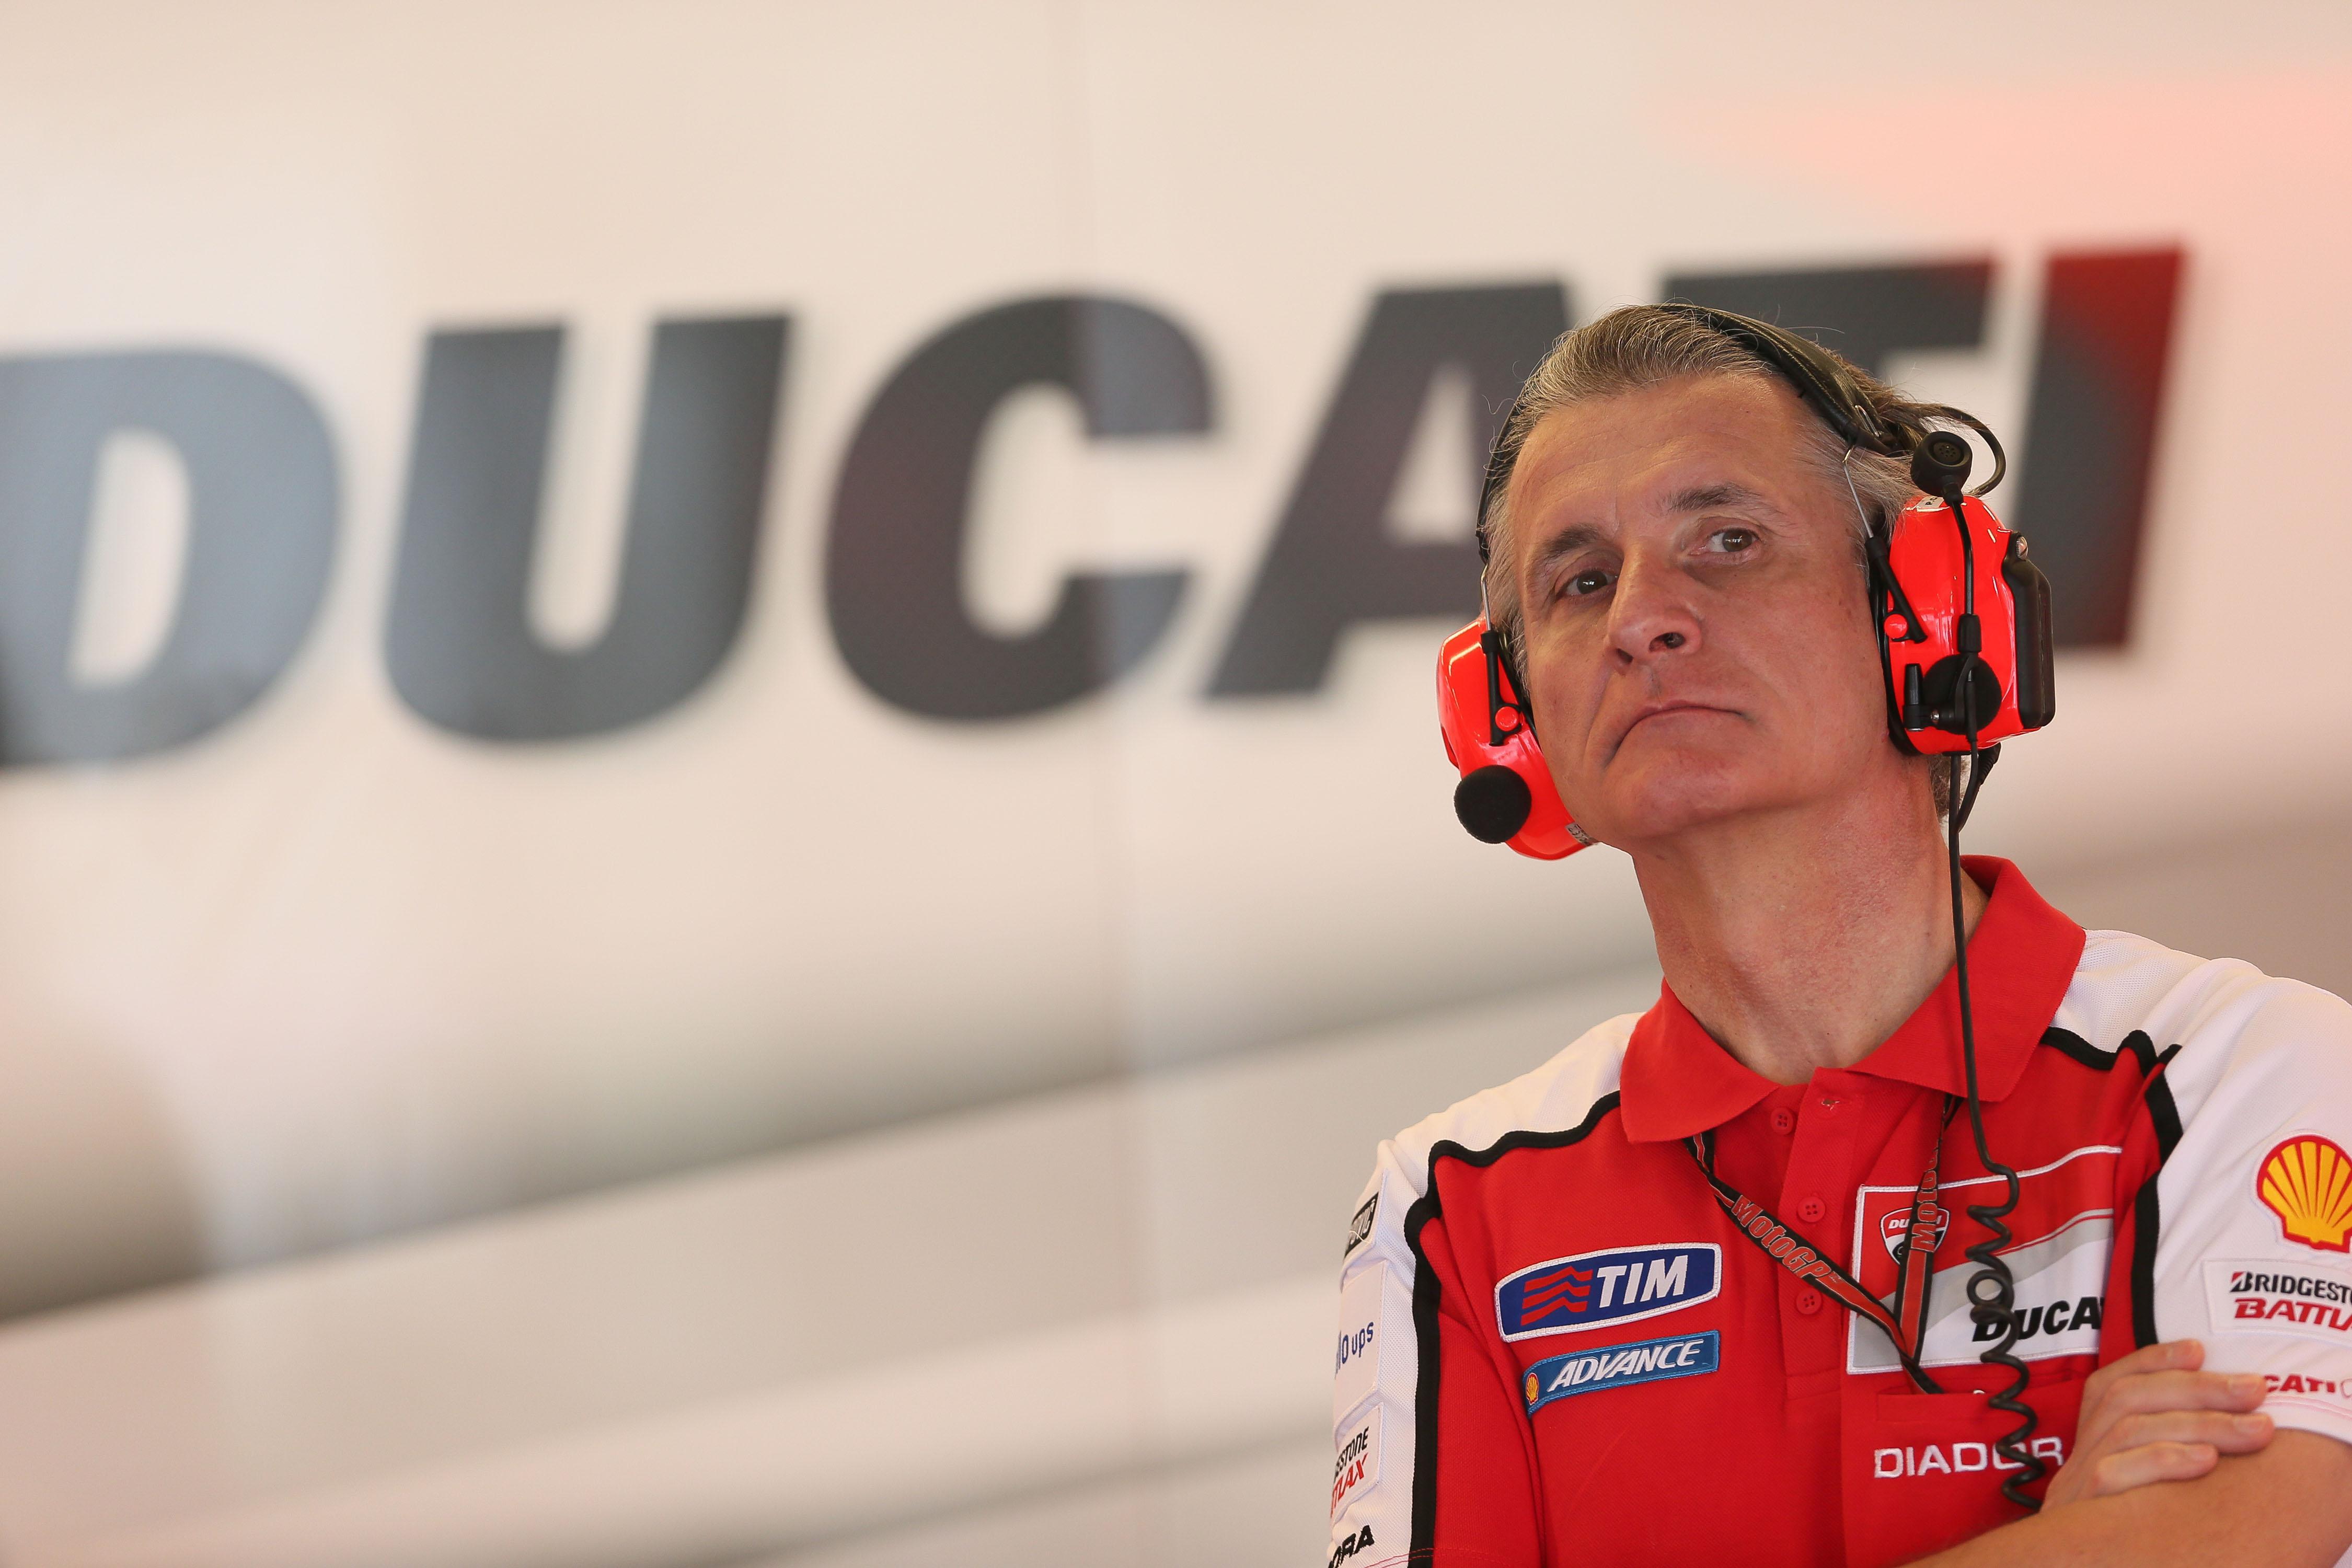 Ducati Sporting Director Paolo Ciabatti explains 'big plan' after Lorenzo signing